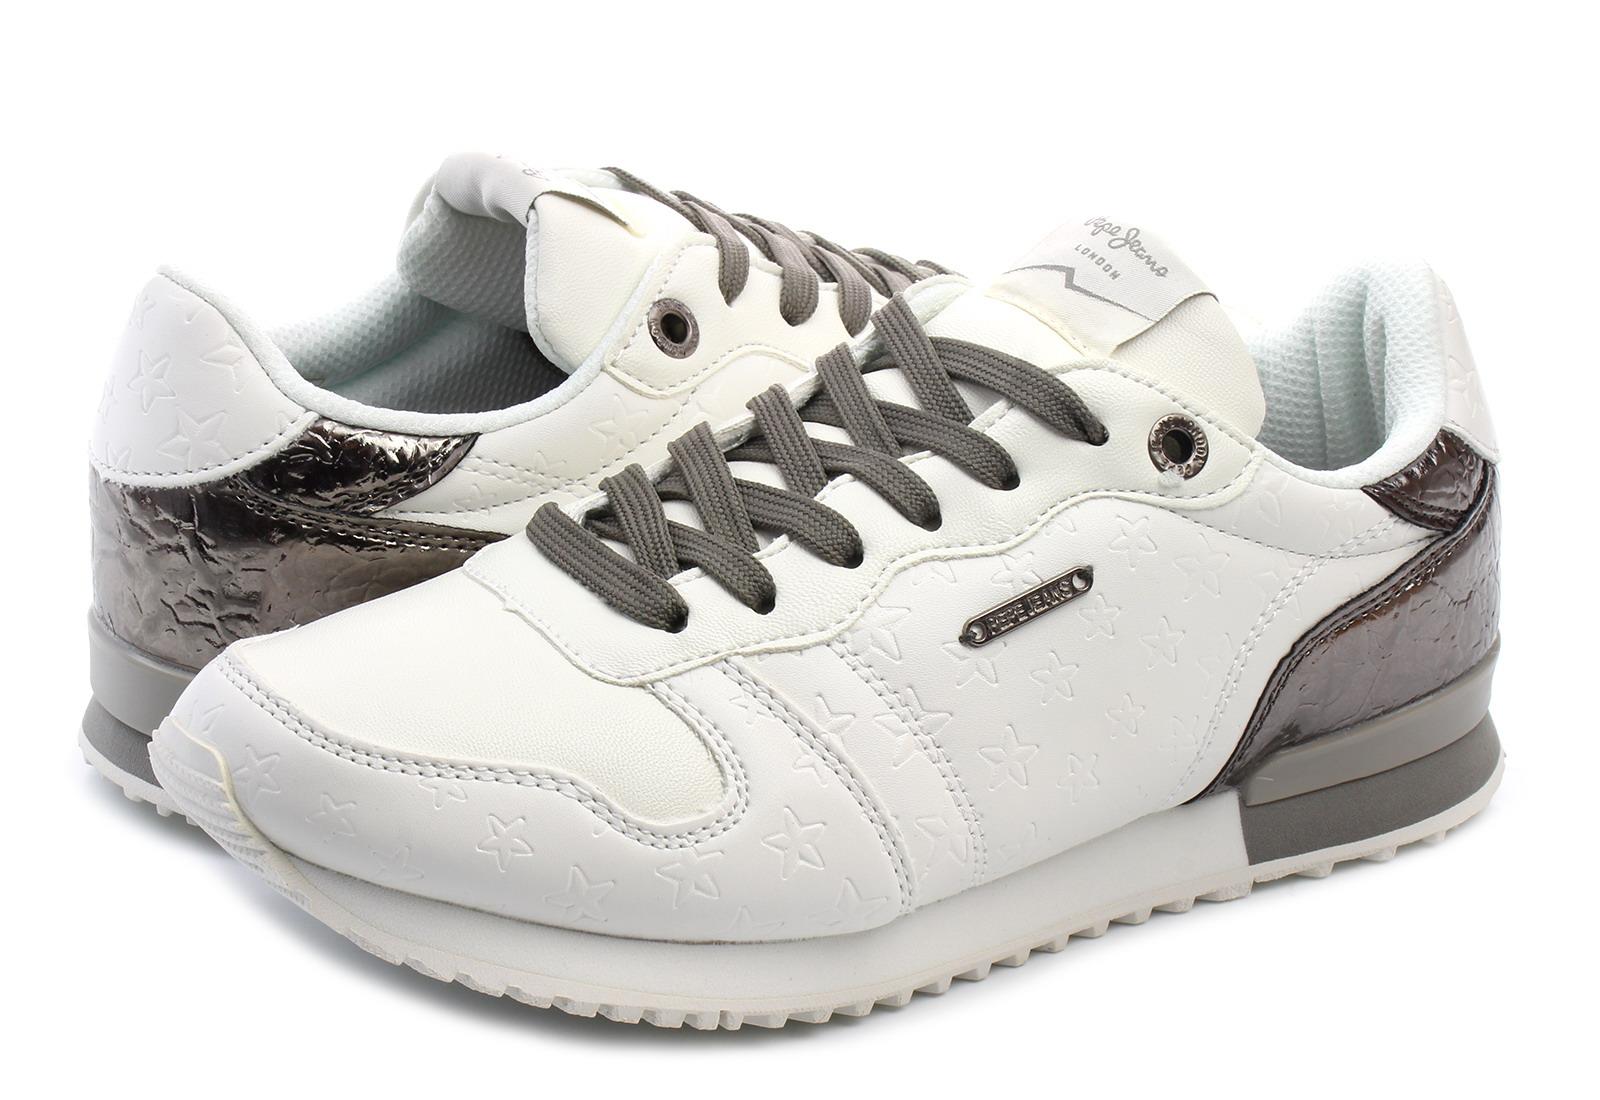 Pepe Jeans Nízké boty Gable